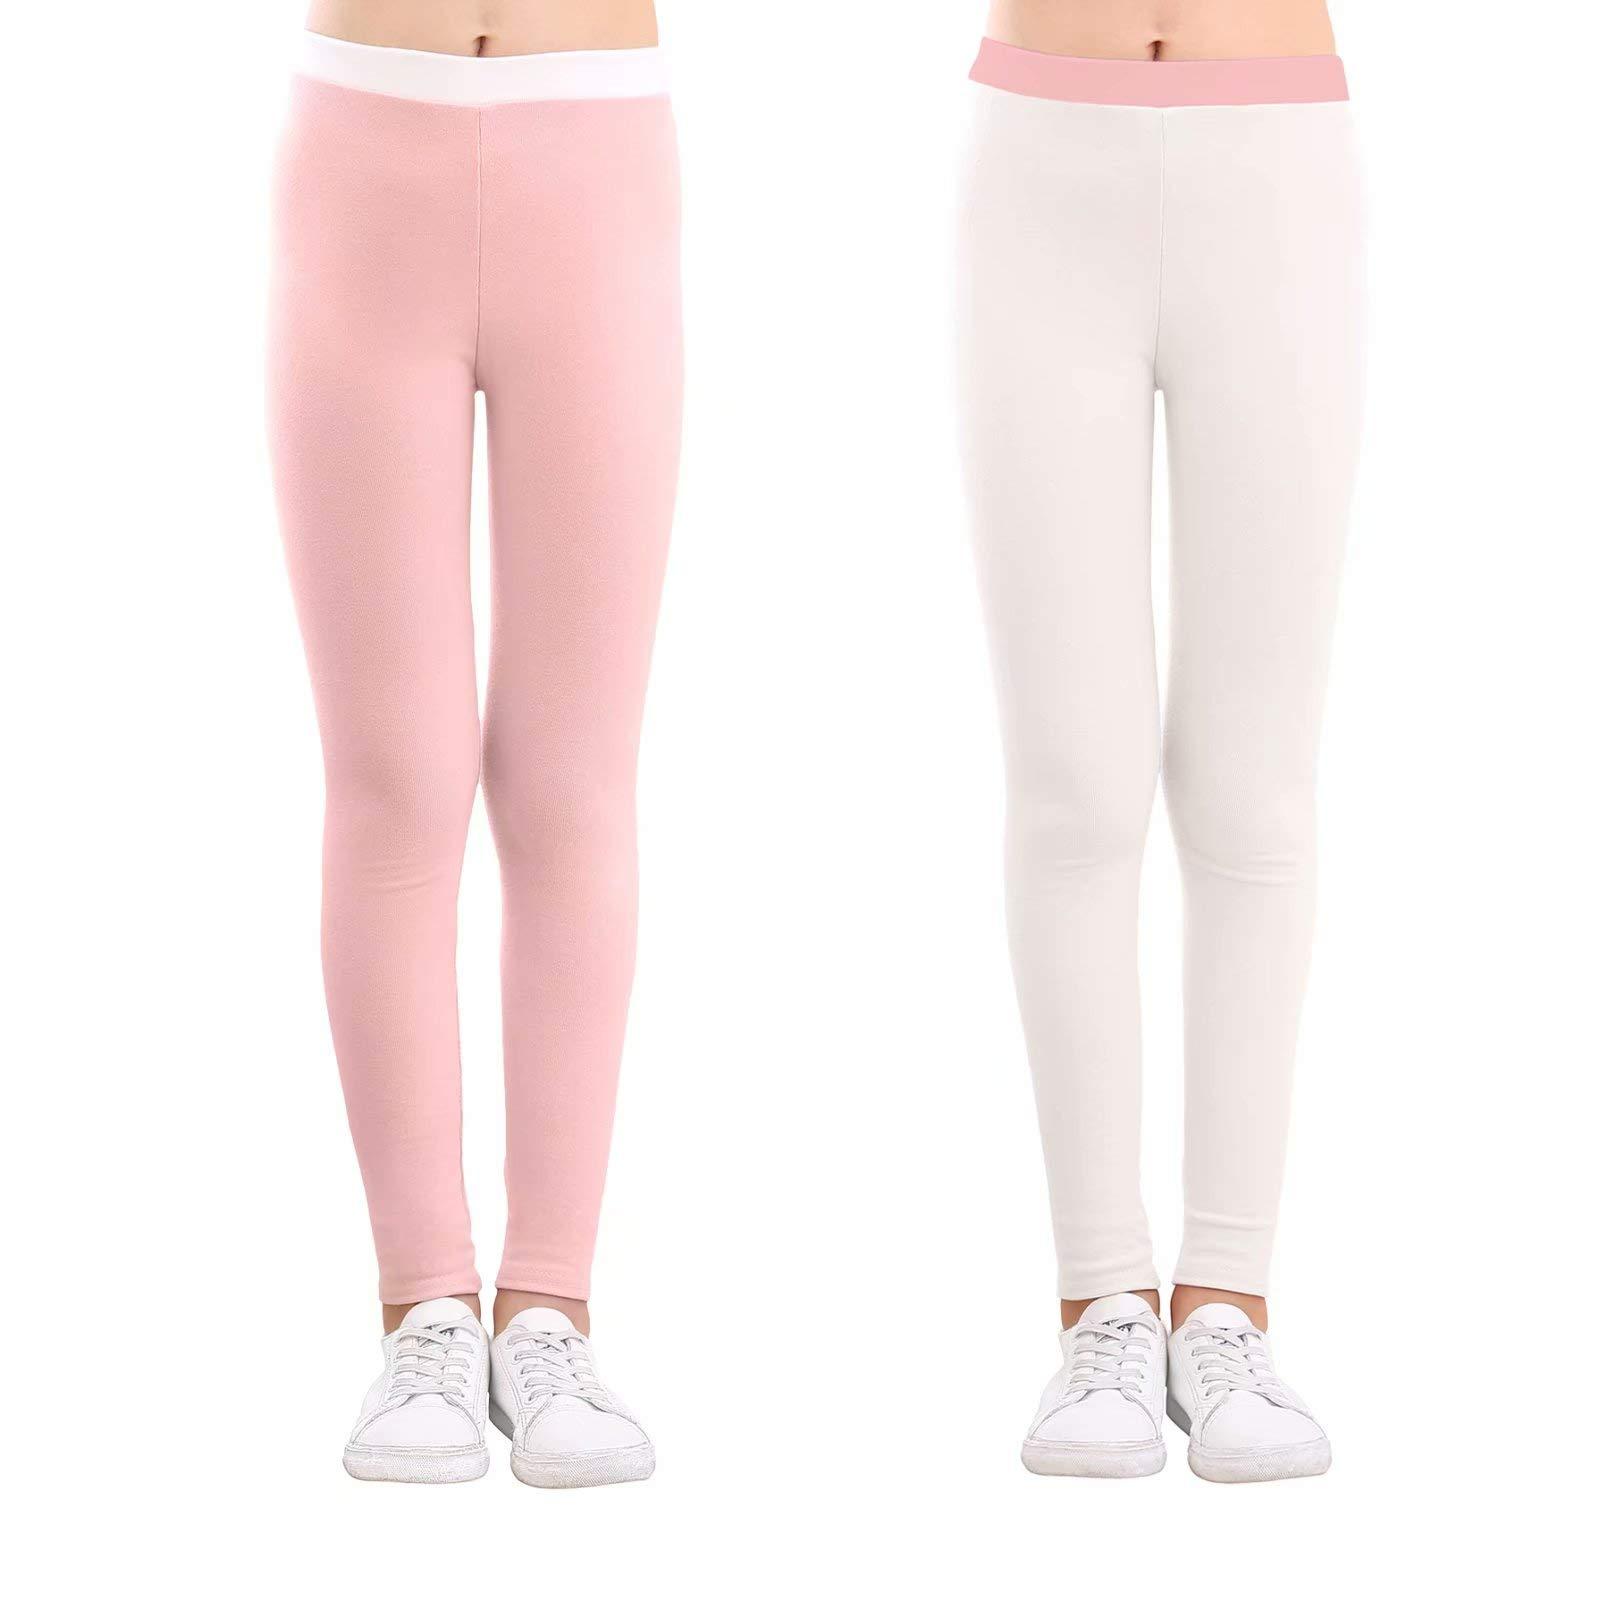 slaixiu Cotton Ankle Length Girls Leggings Stretchy Kids Pants 3-12y(GP04_Pink&White_110)